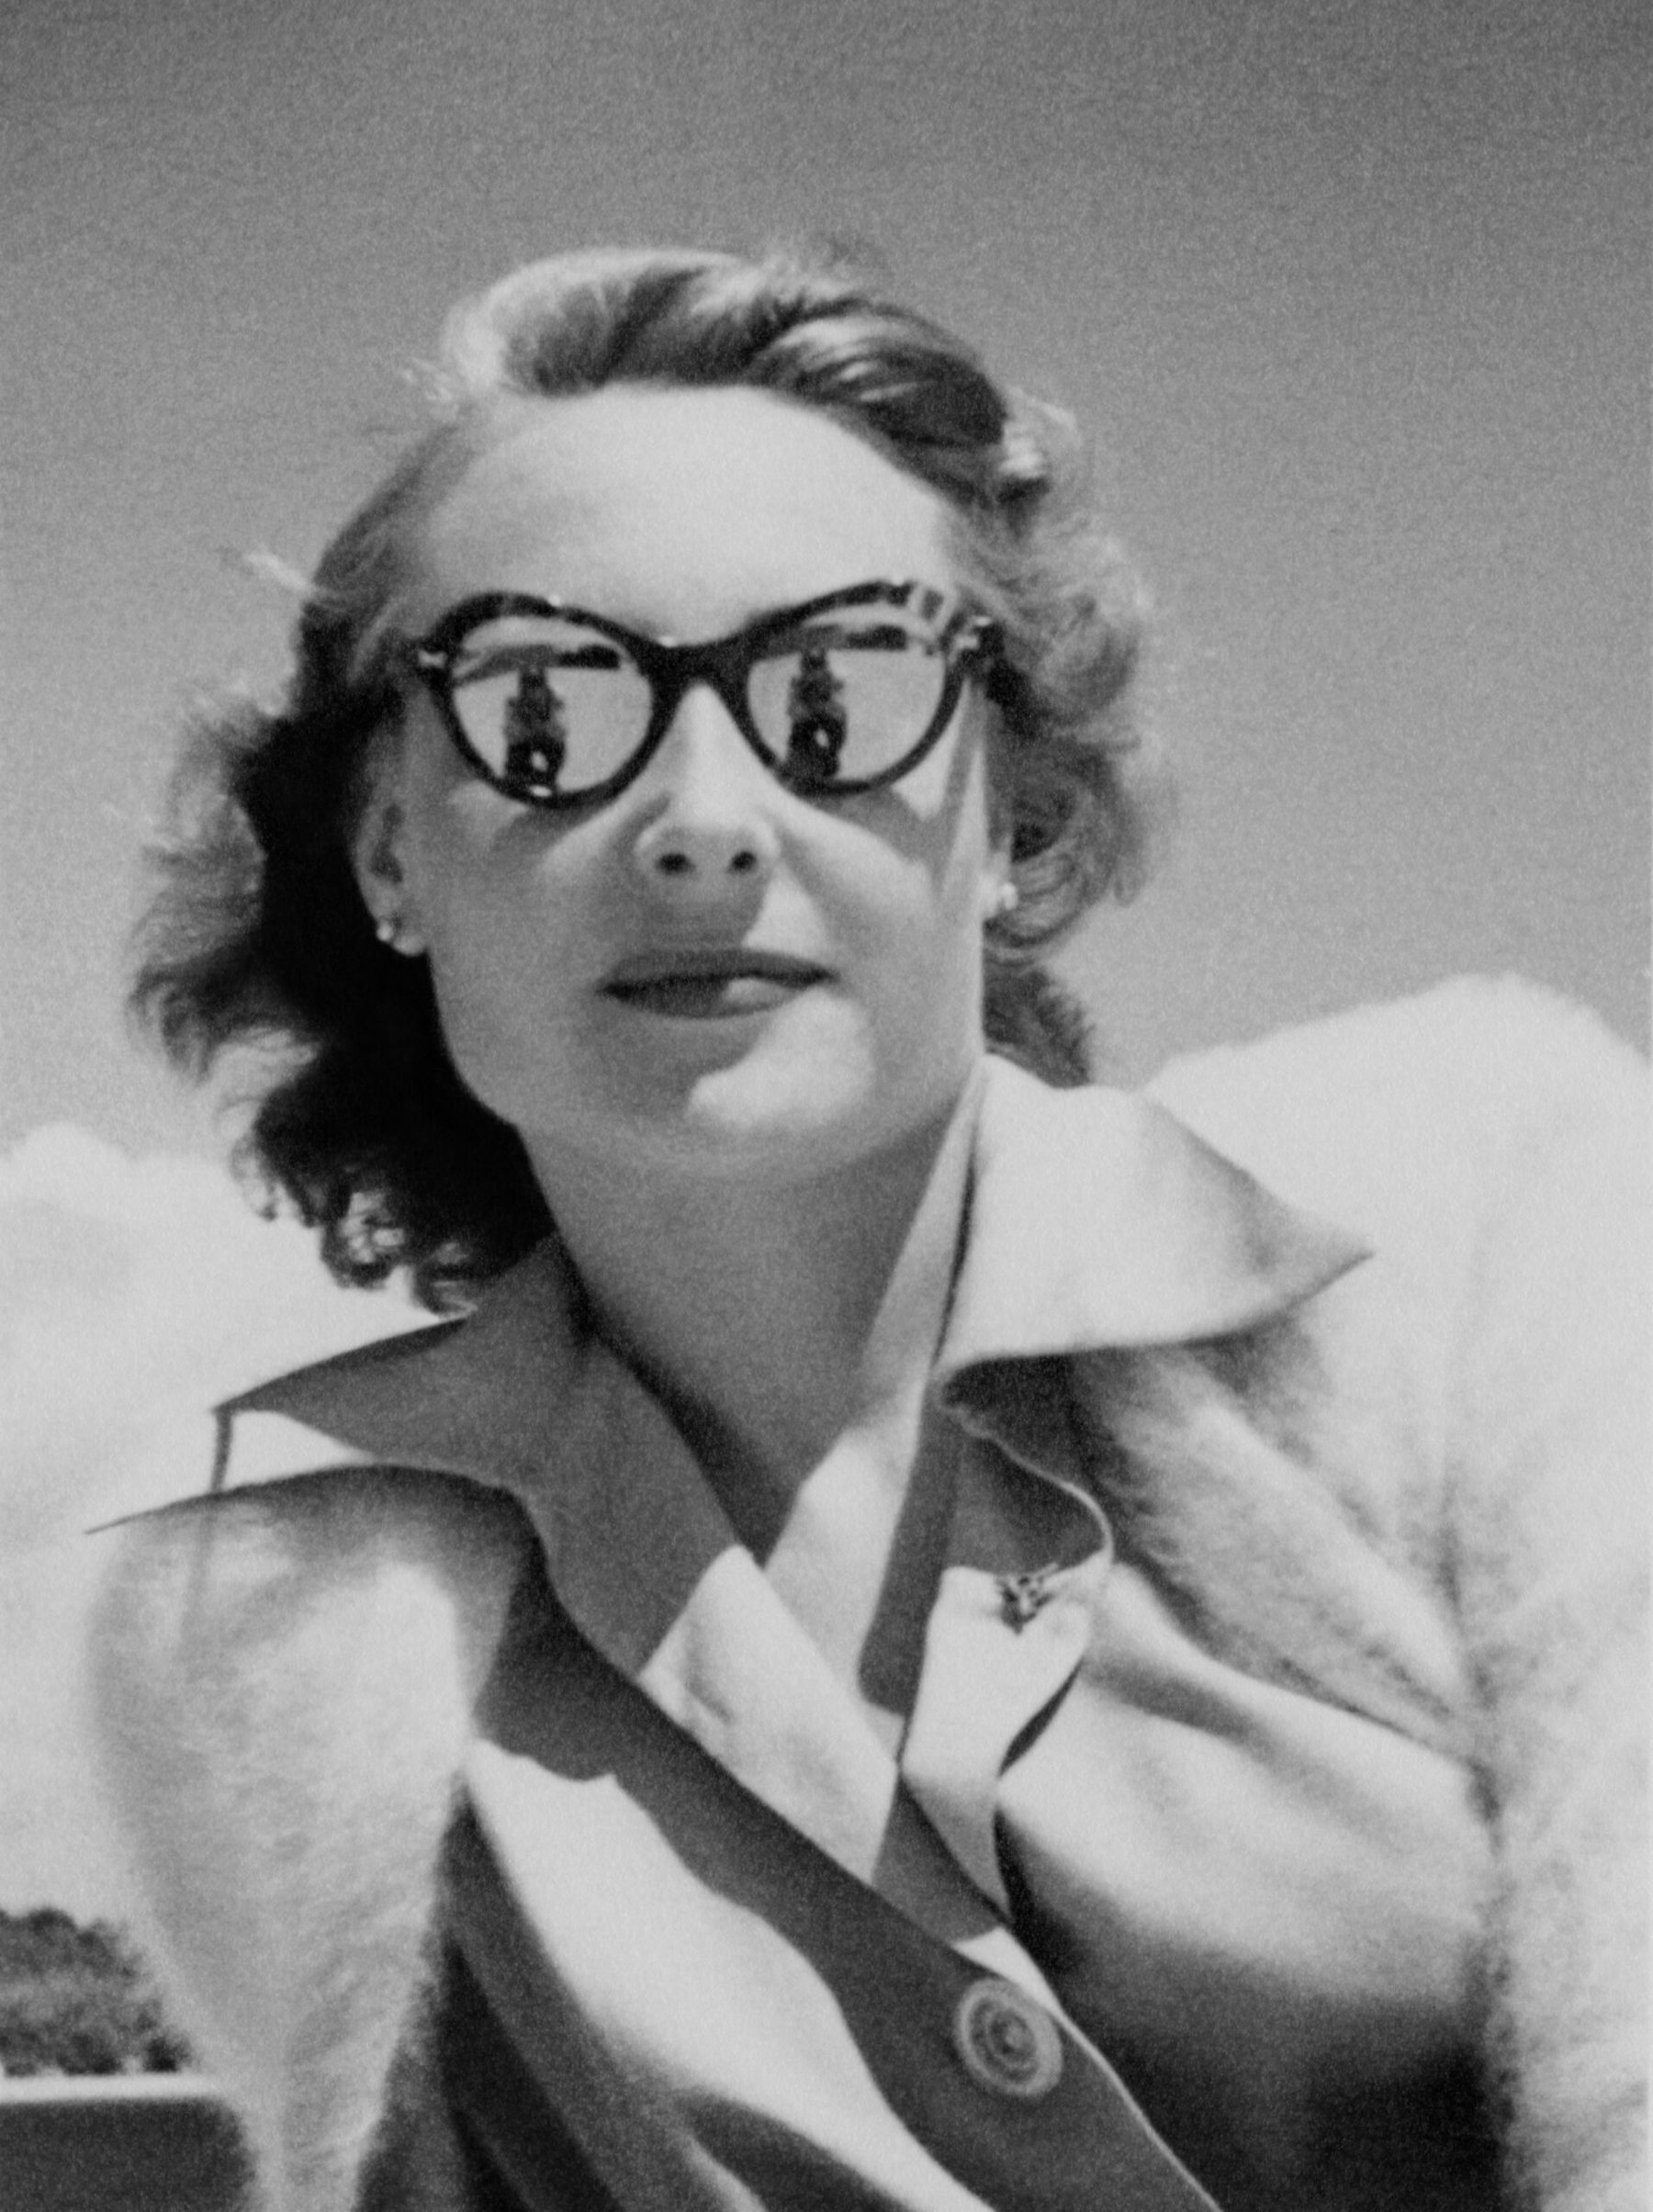 Julietta Looks Ahead, Portinho da Arrábida, 1949 (photo borrowed from Luis Silva Pinto )